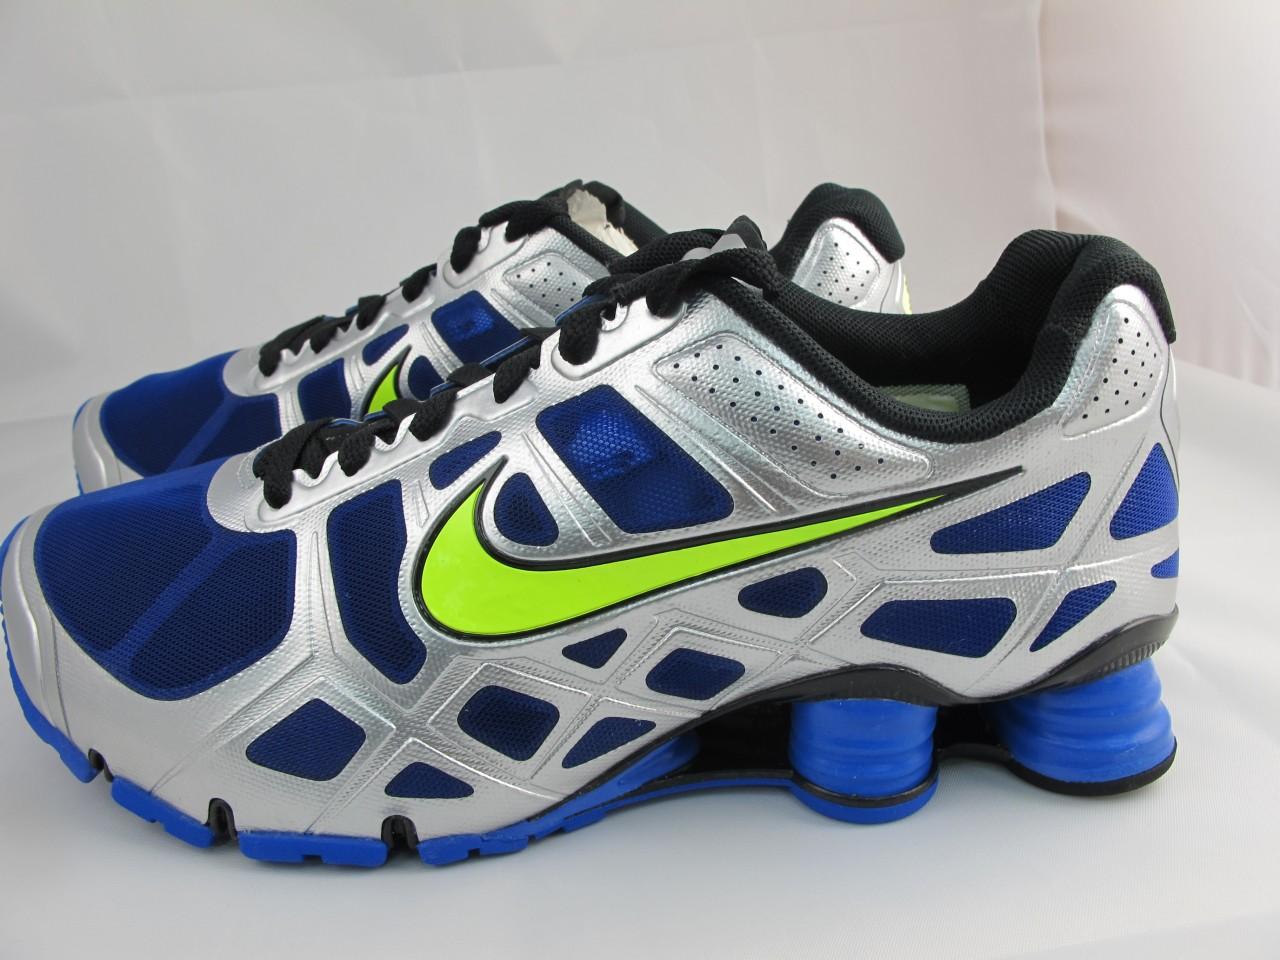 Nike Shox Blue And Green